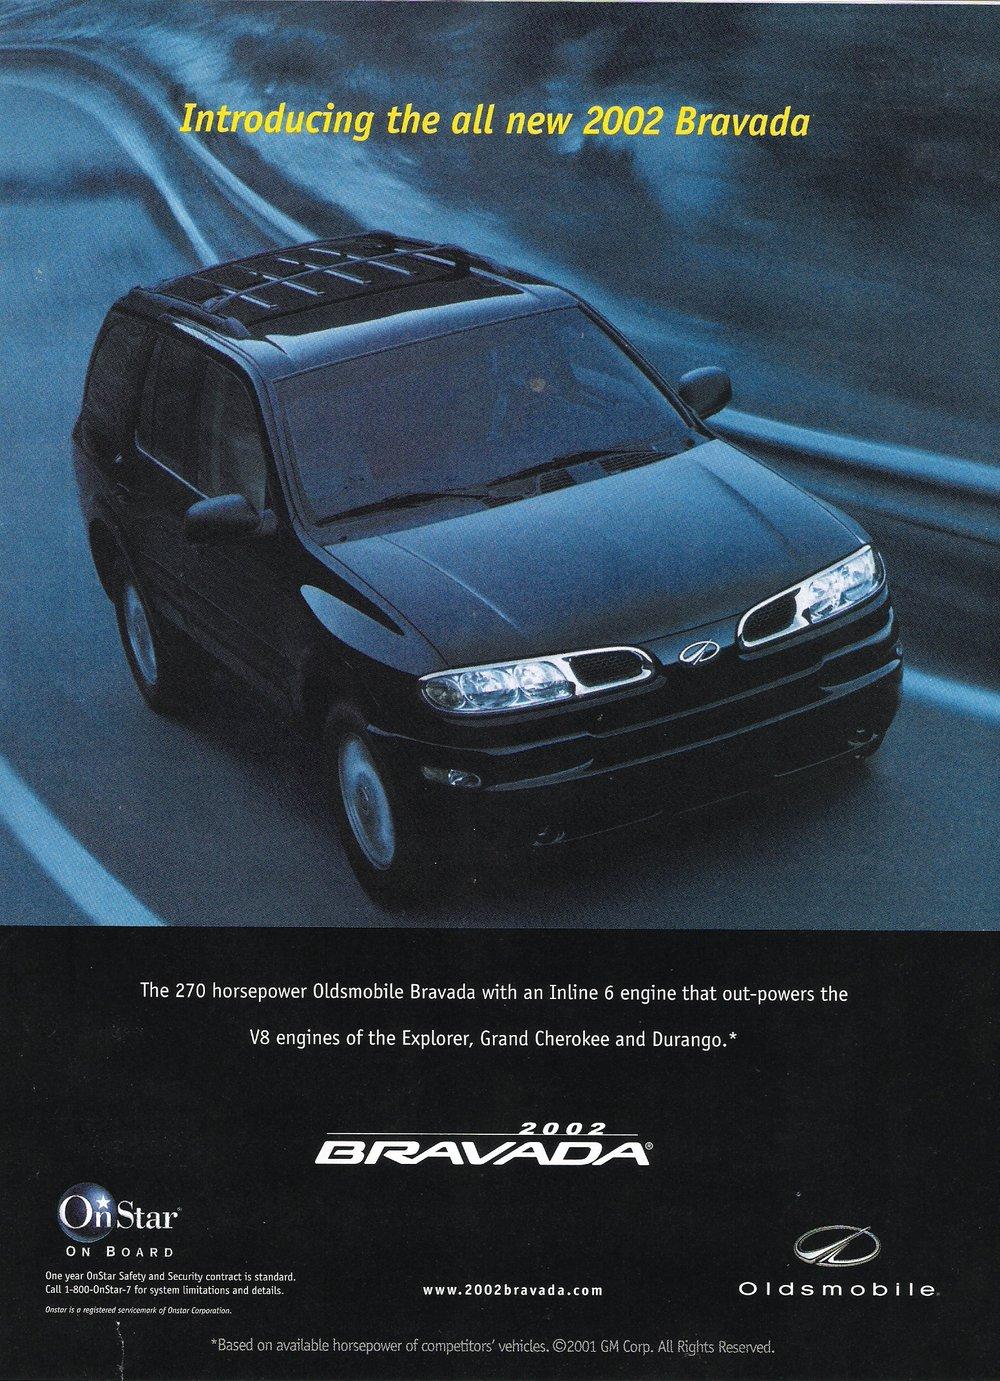 GM Oldsmobile - Bravada Print Ad